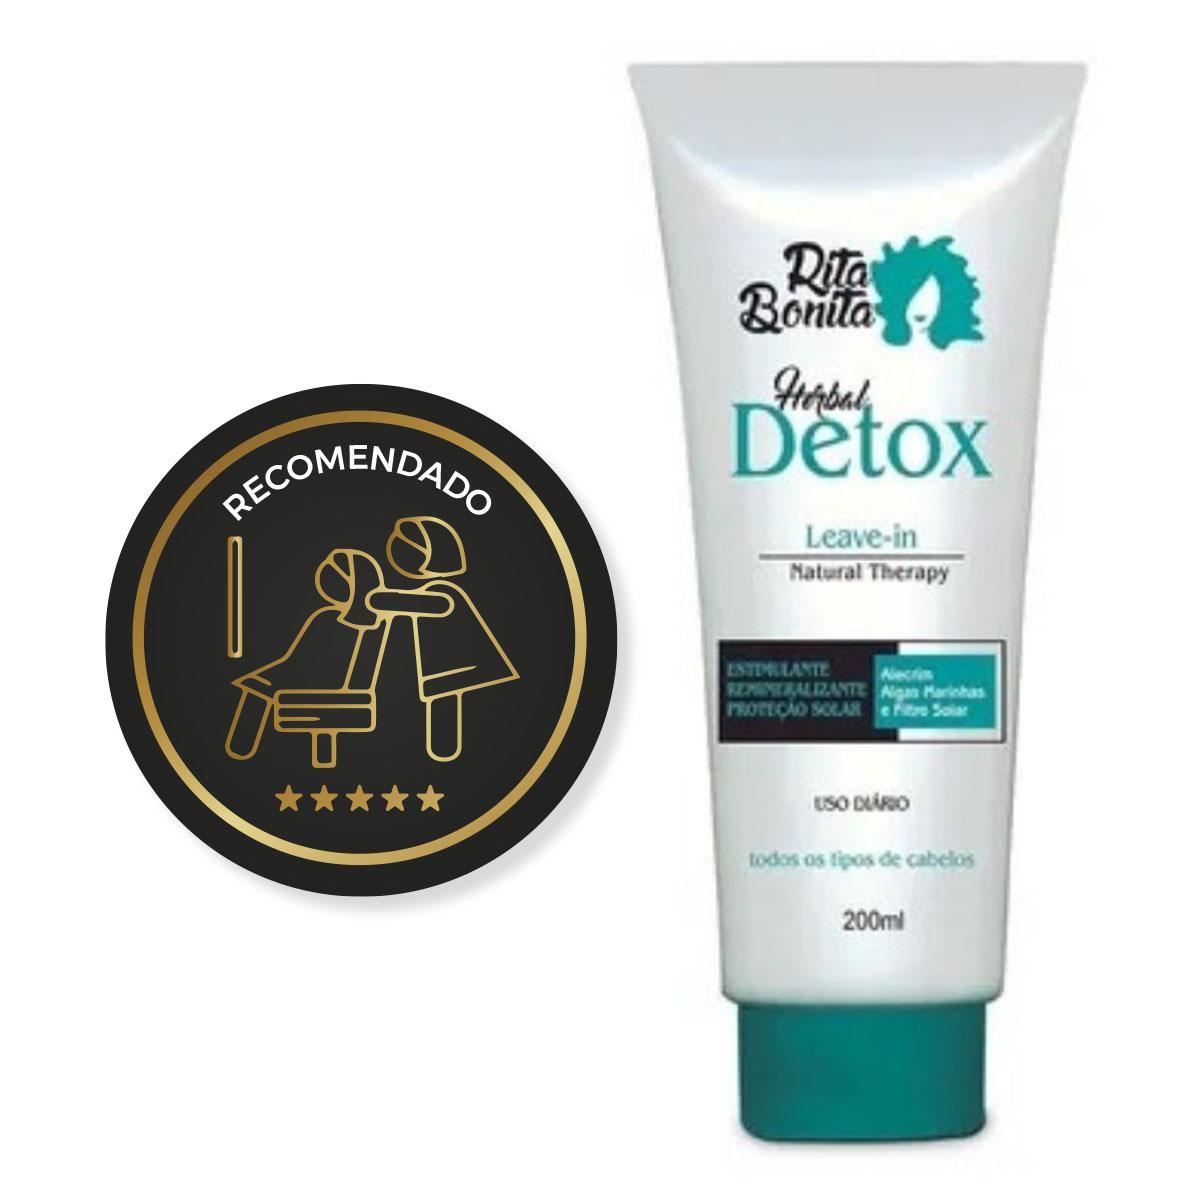 Herbal Detox - Leave-in Rita Bonita 200ml - Com Proteção Termica e Filtro Solar